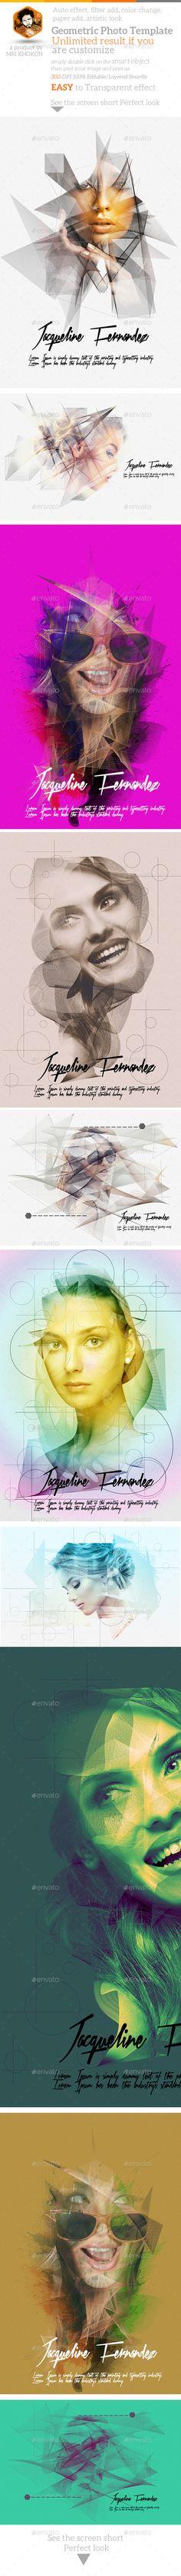 Geometric Photo Manipulation (Artistic)